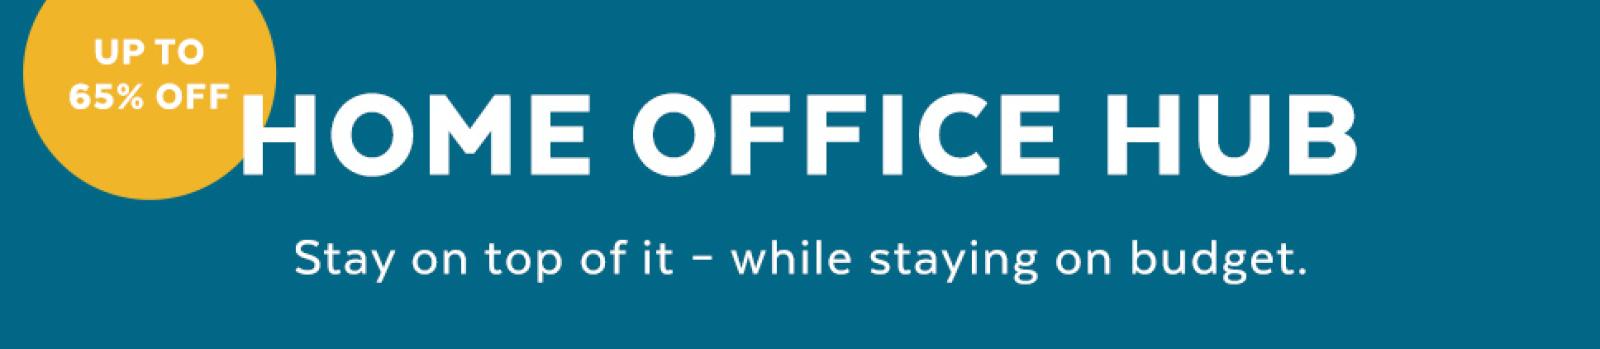 Home Office Hub